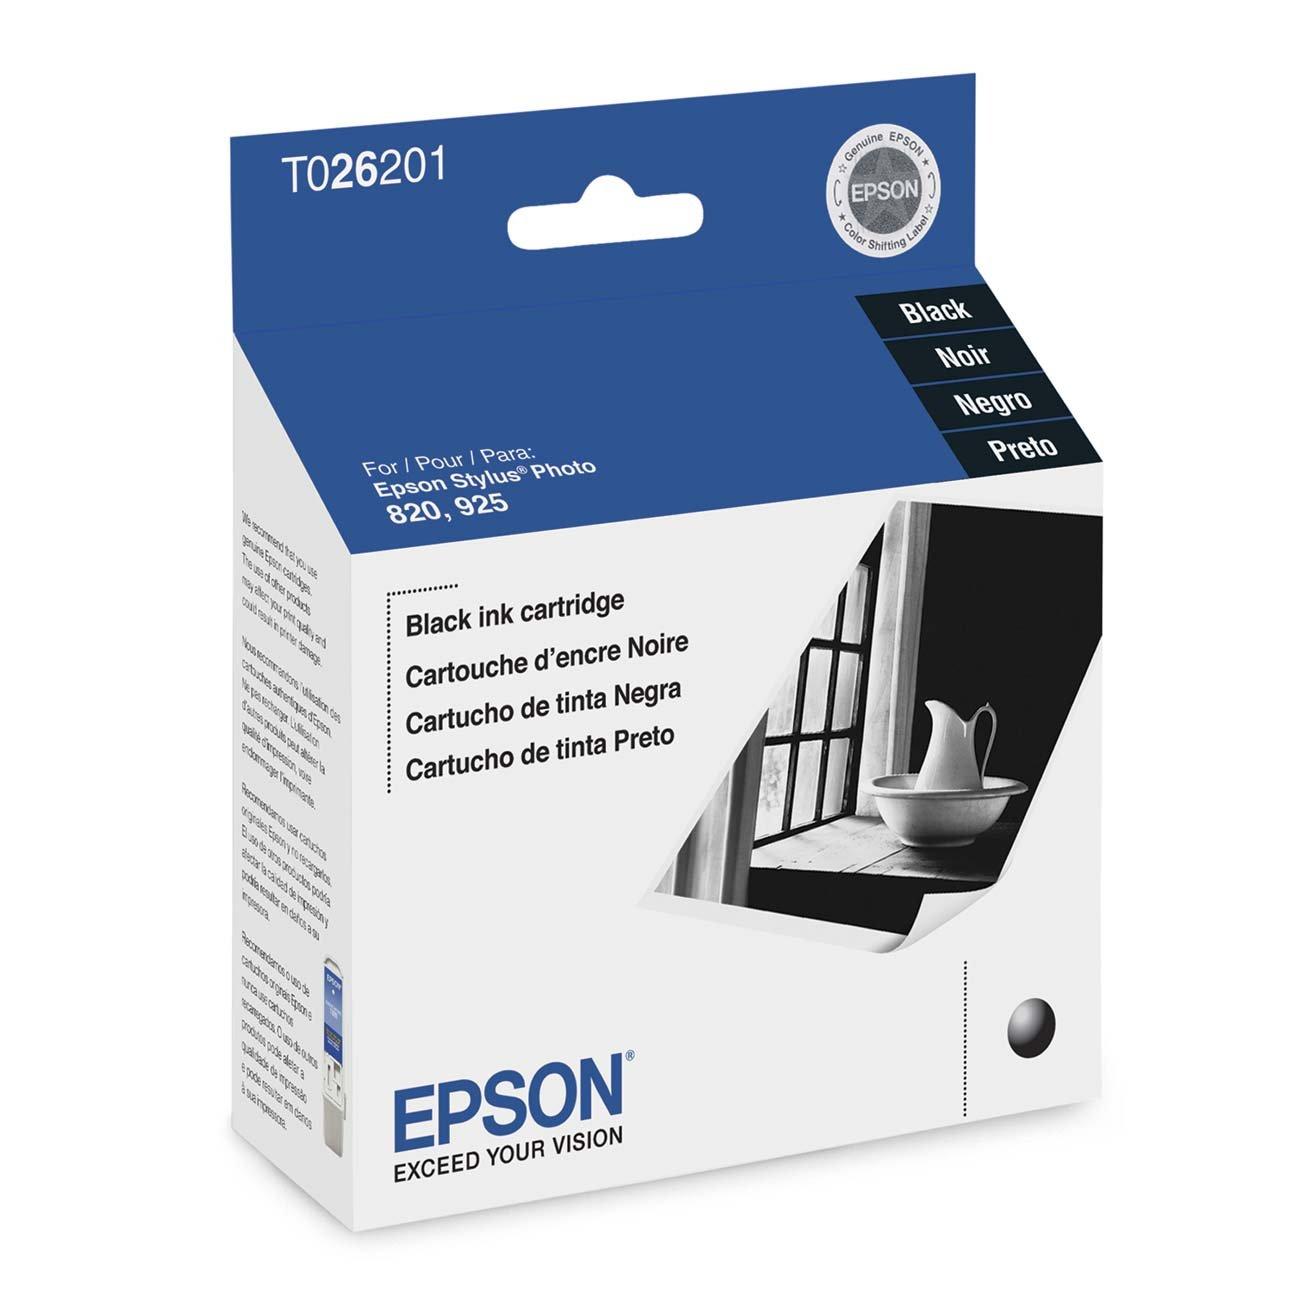 Amazon.com: Epson DURABrite Ultra Ink Cartridges, Amarillo ...